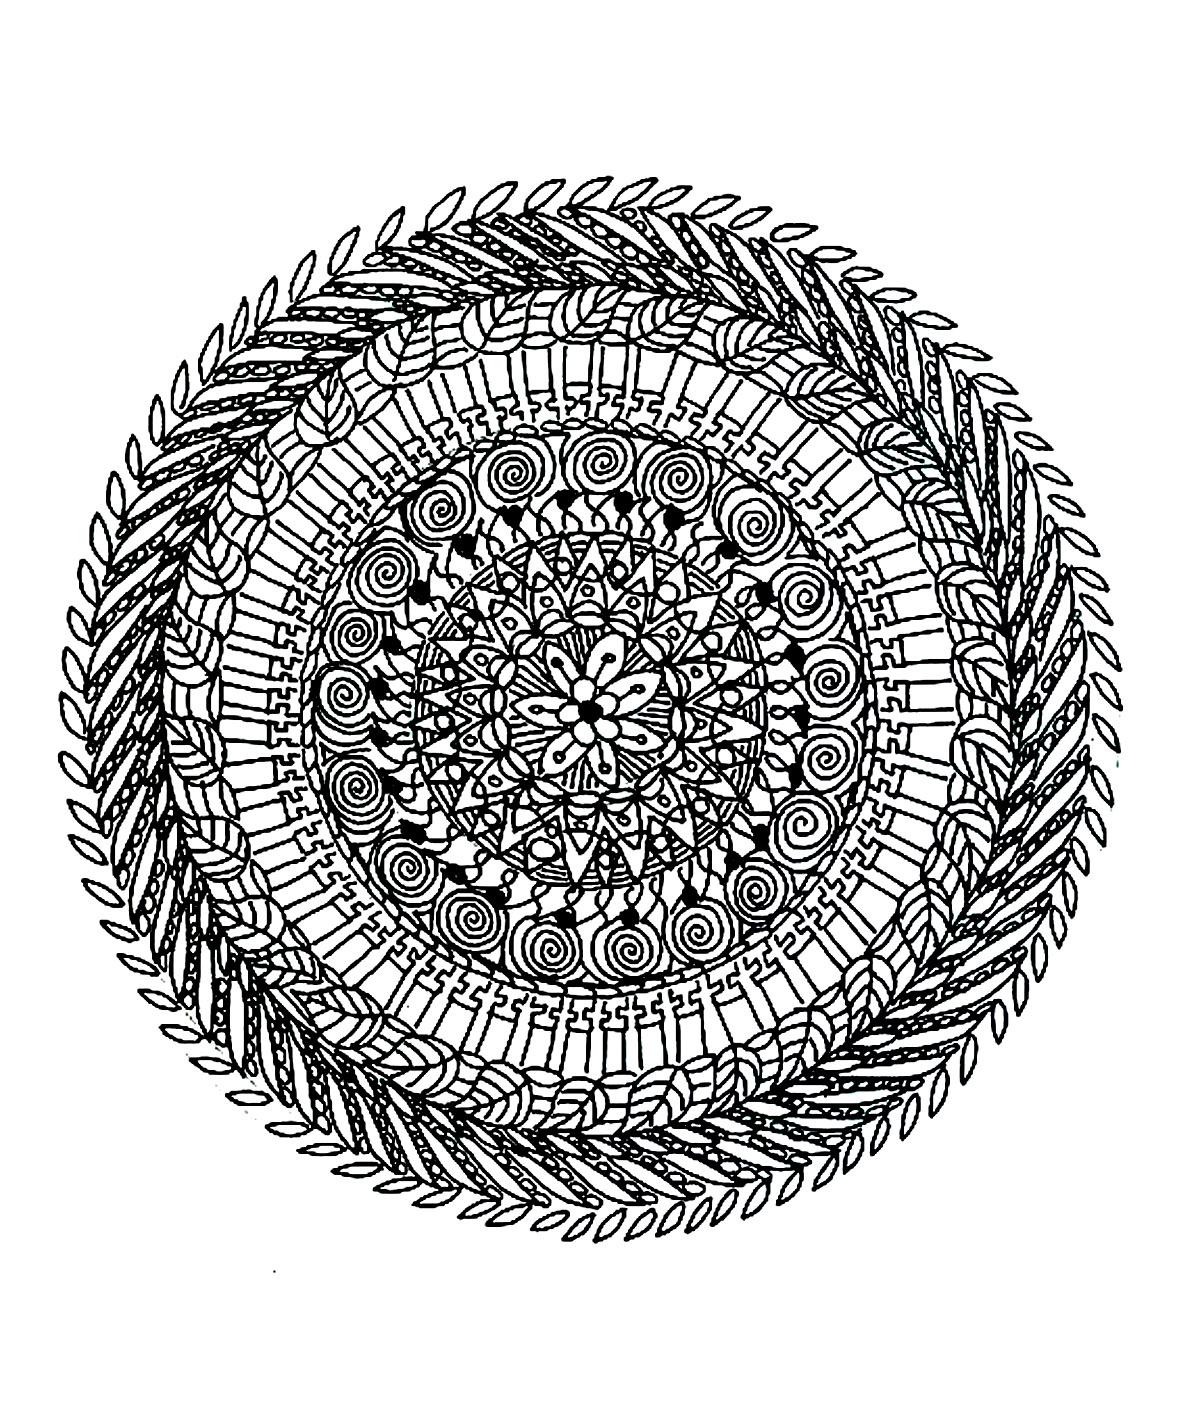 Mandalas 16804 Mandalas Disegni Da Colorare Per Adulti